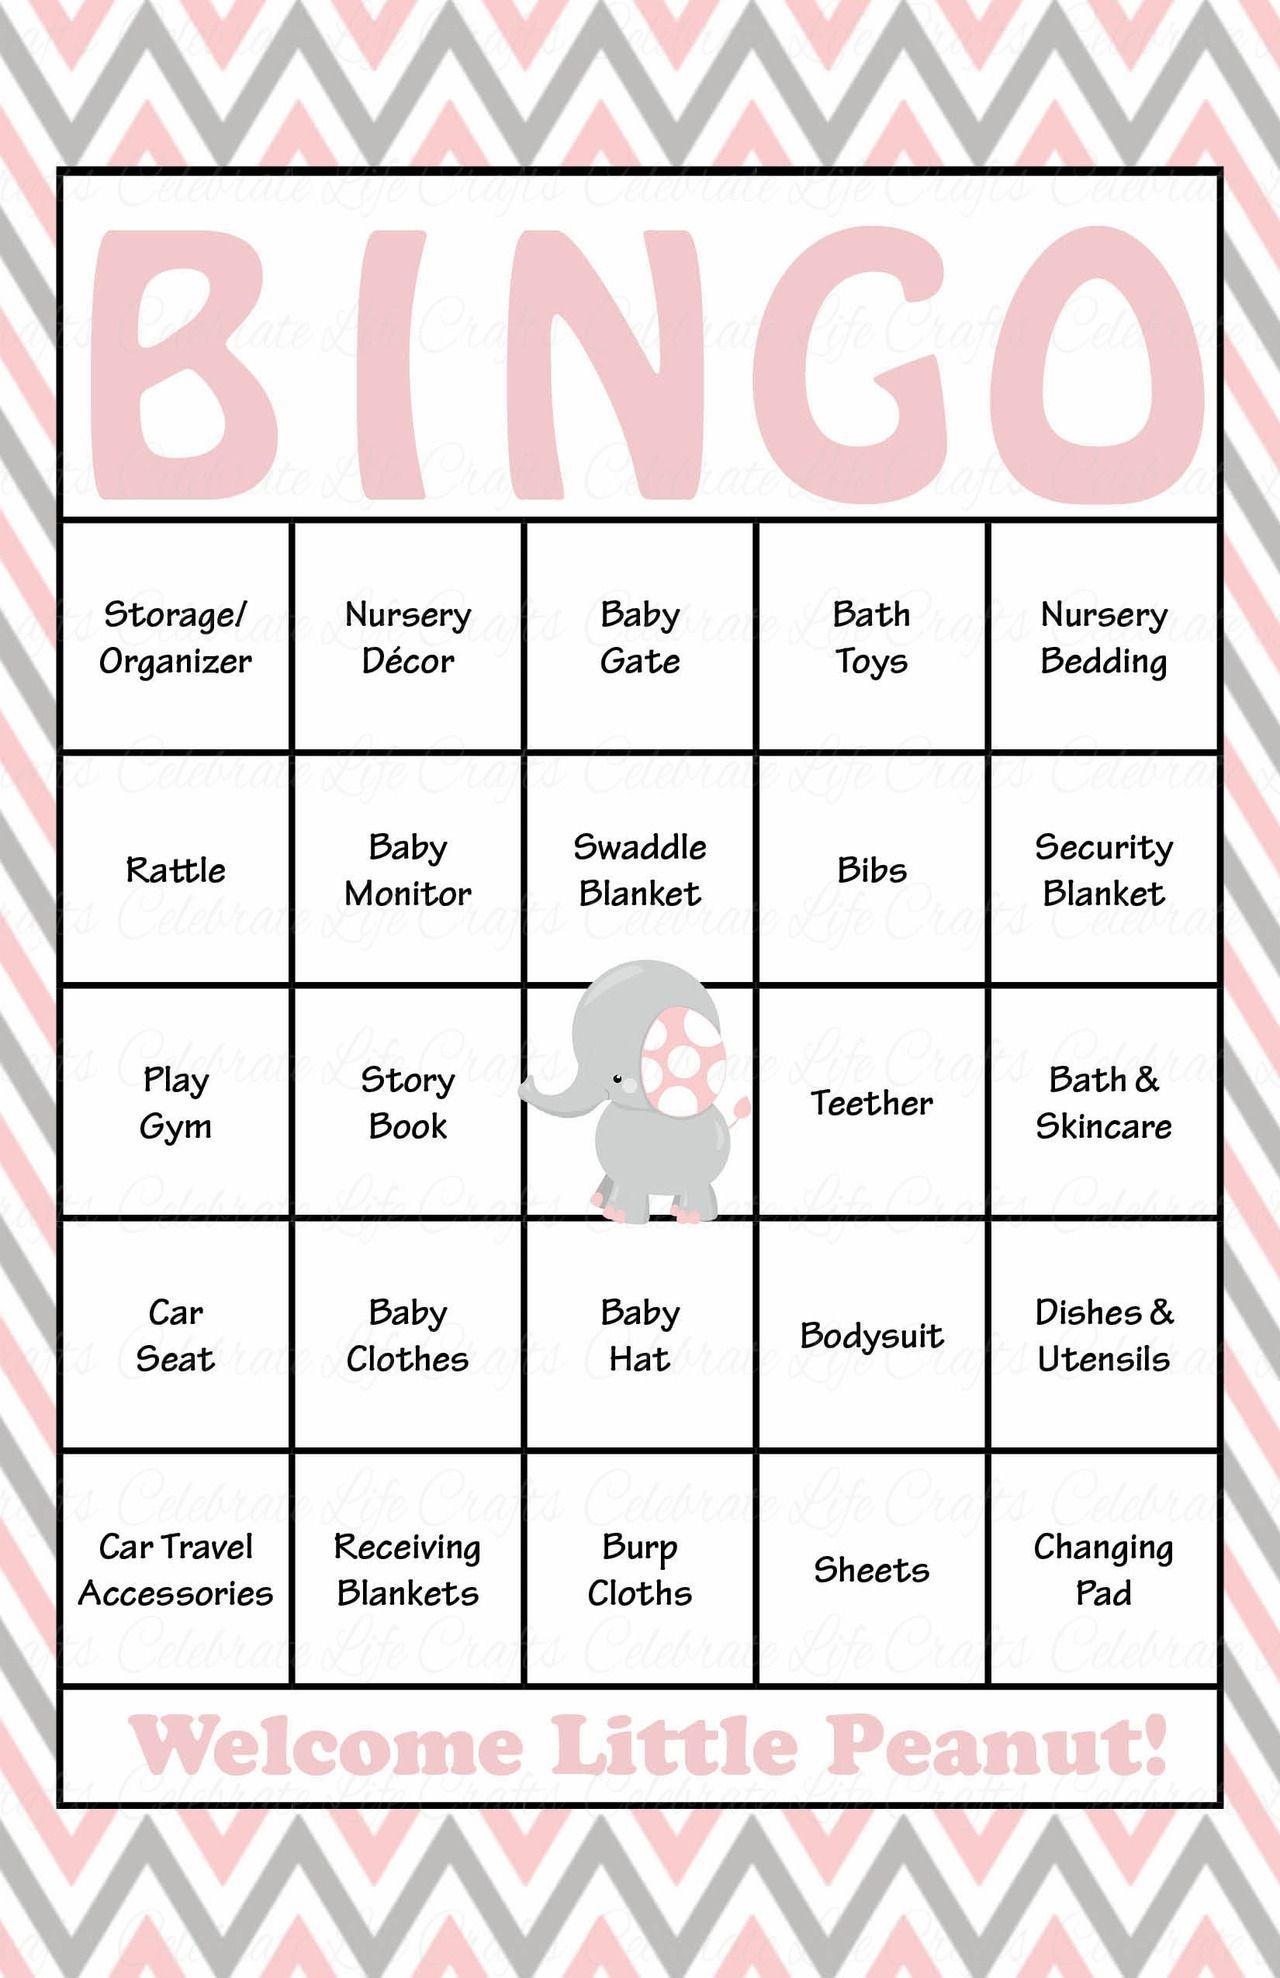 Elephant Baby Bingo Cards - Printable Download - Prefilled - Baby - Free Printable Baby Shower Bingo Cards Pdf